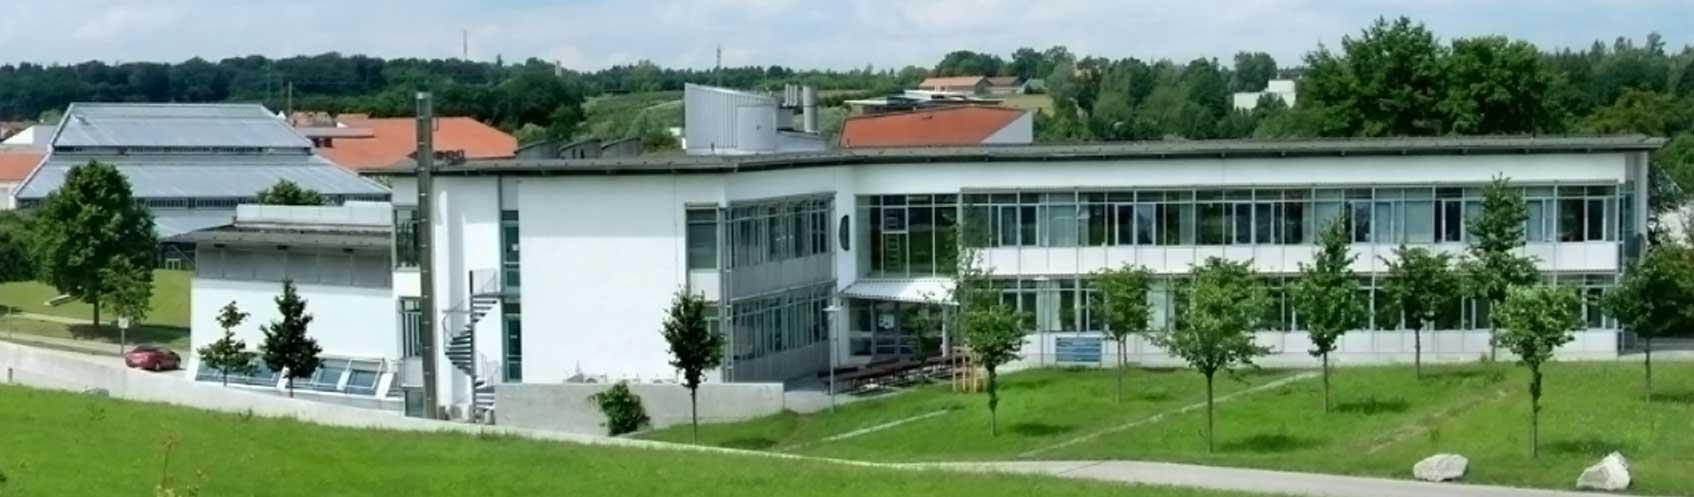 Technische Universität München TUM School of Life Sciences